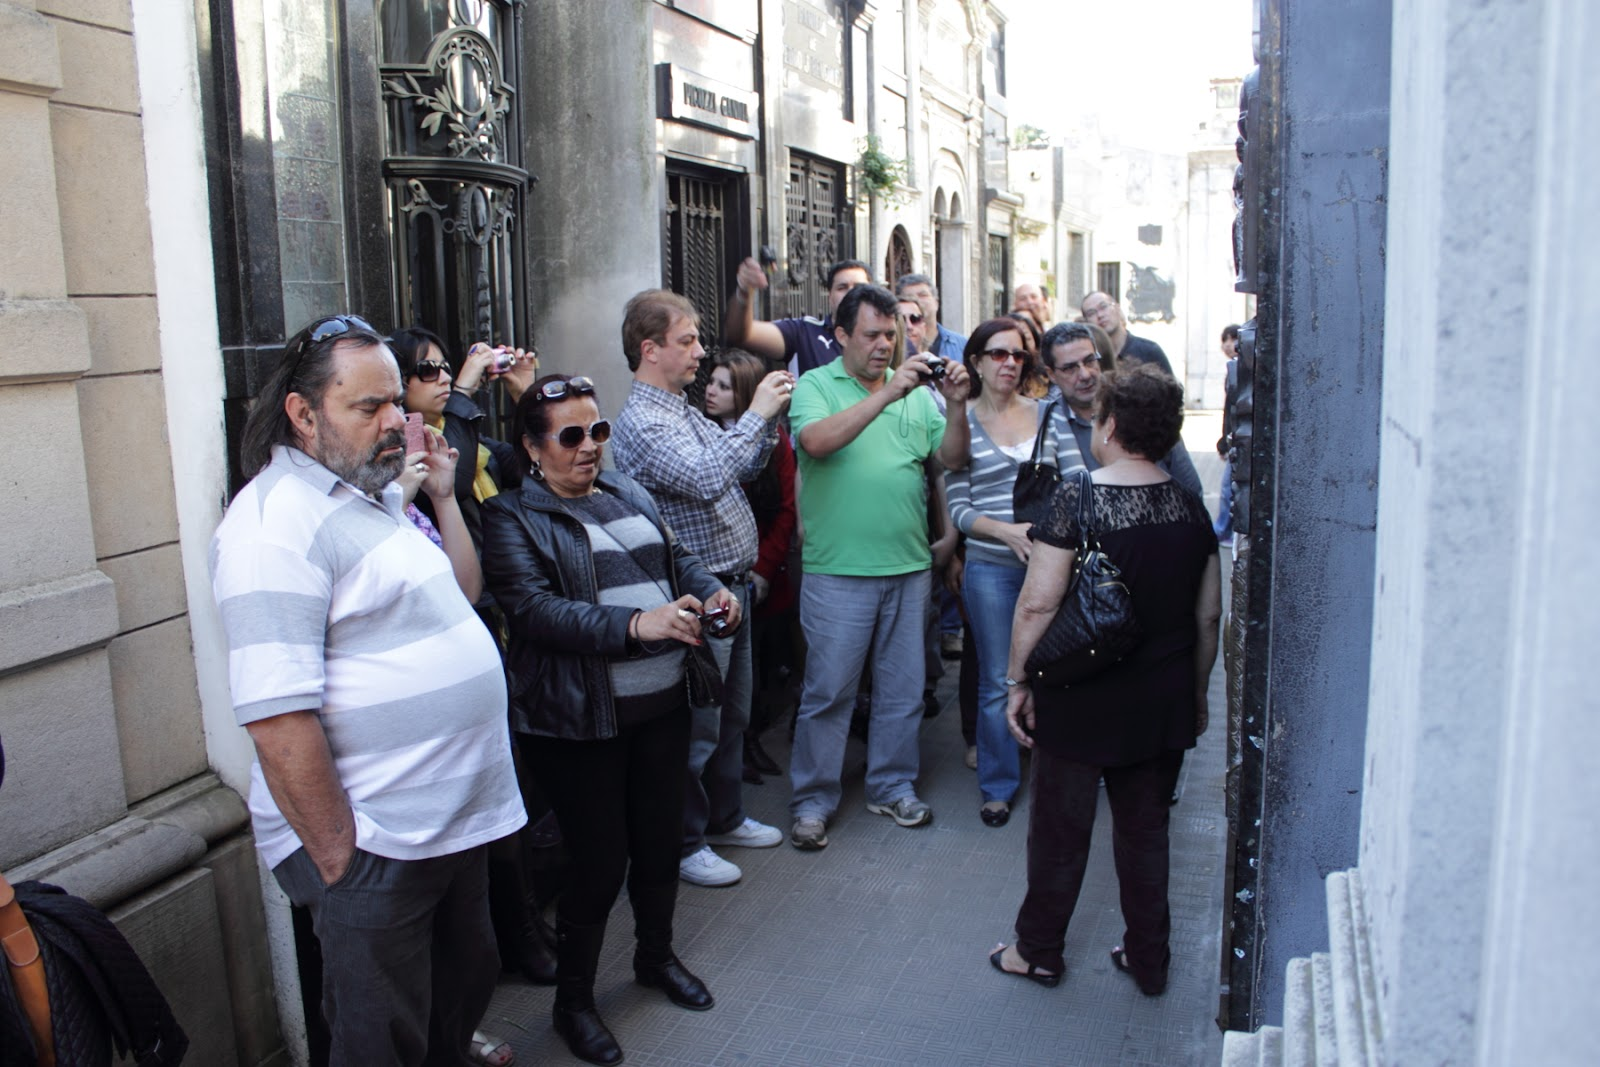 Eva Peron's grave - its a major tourist draw